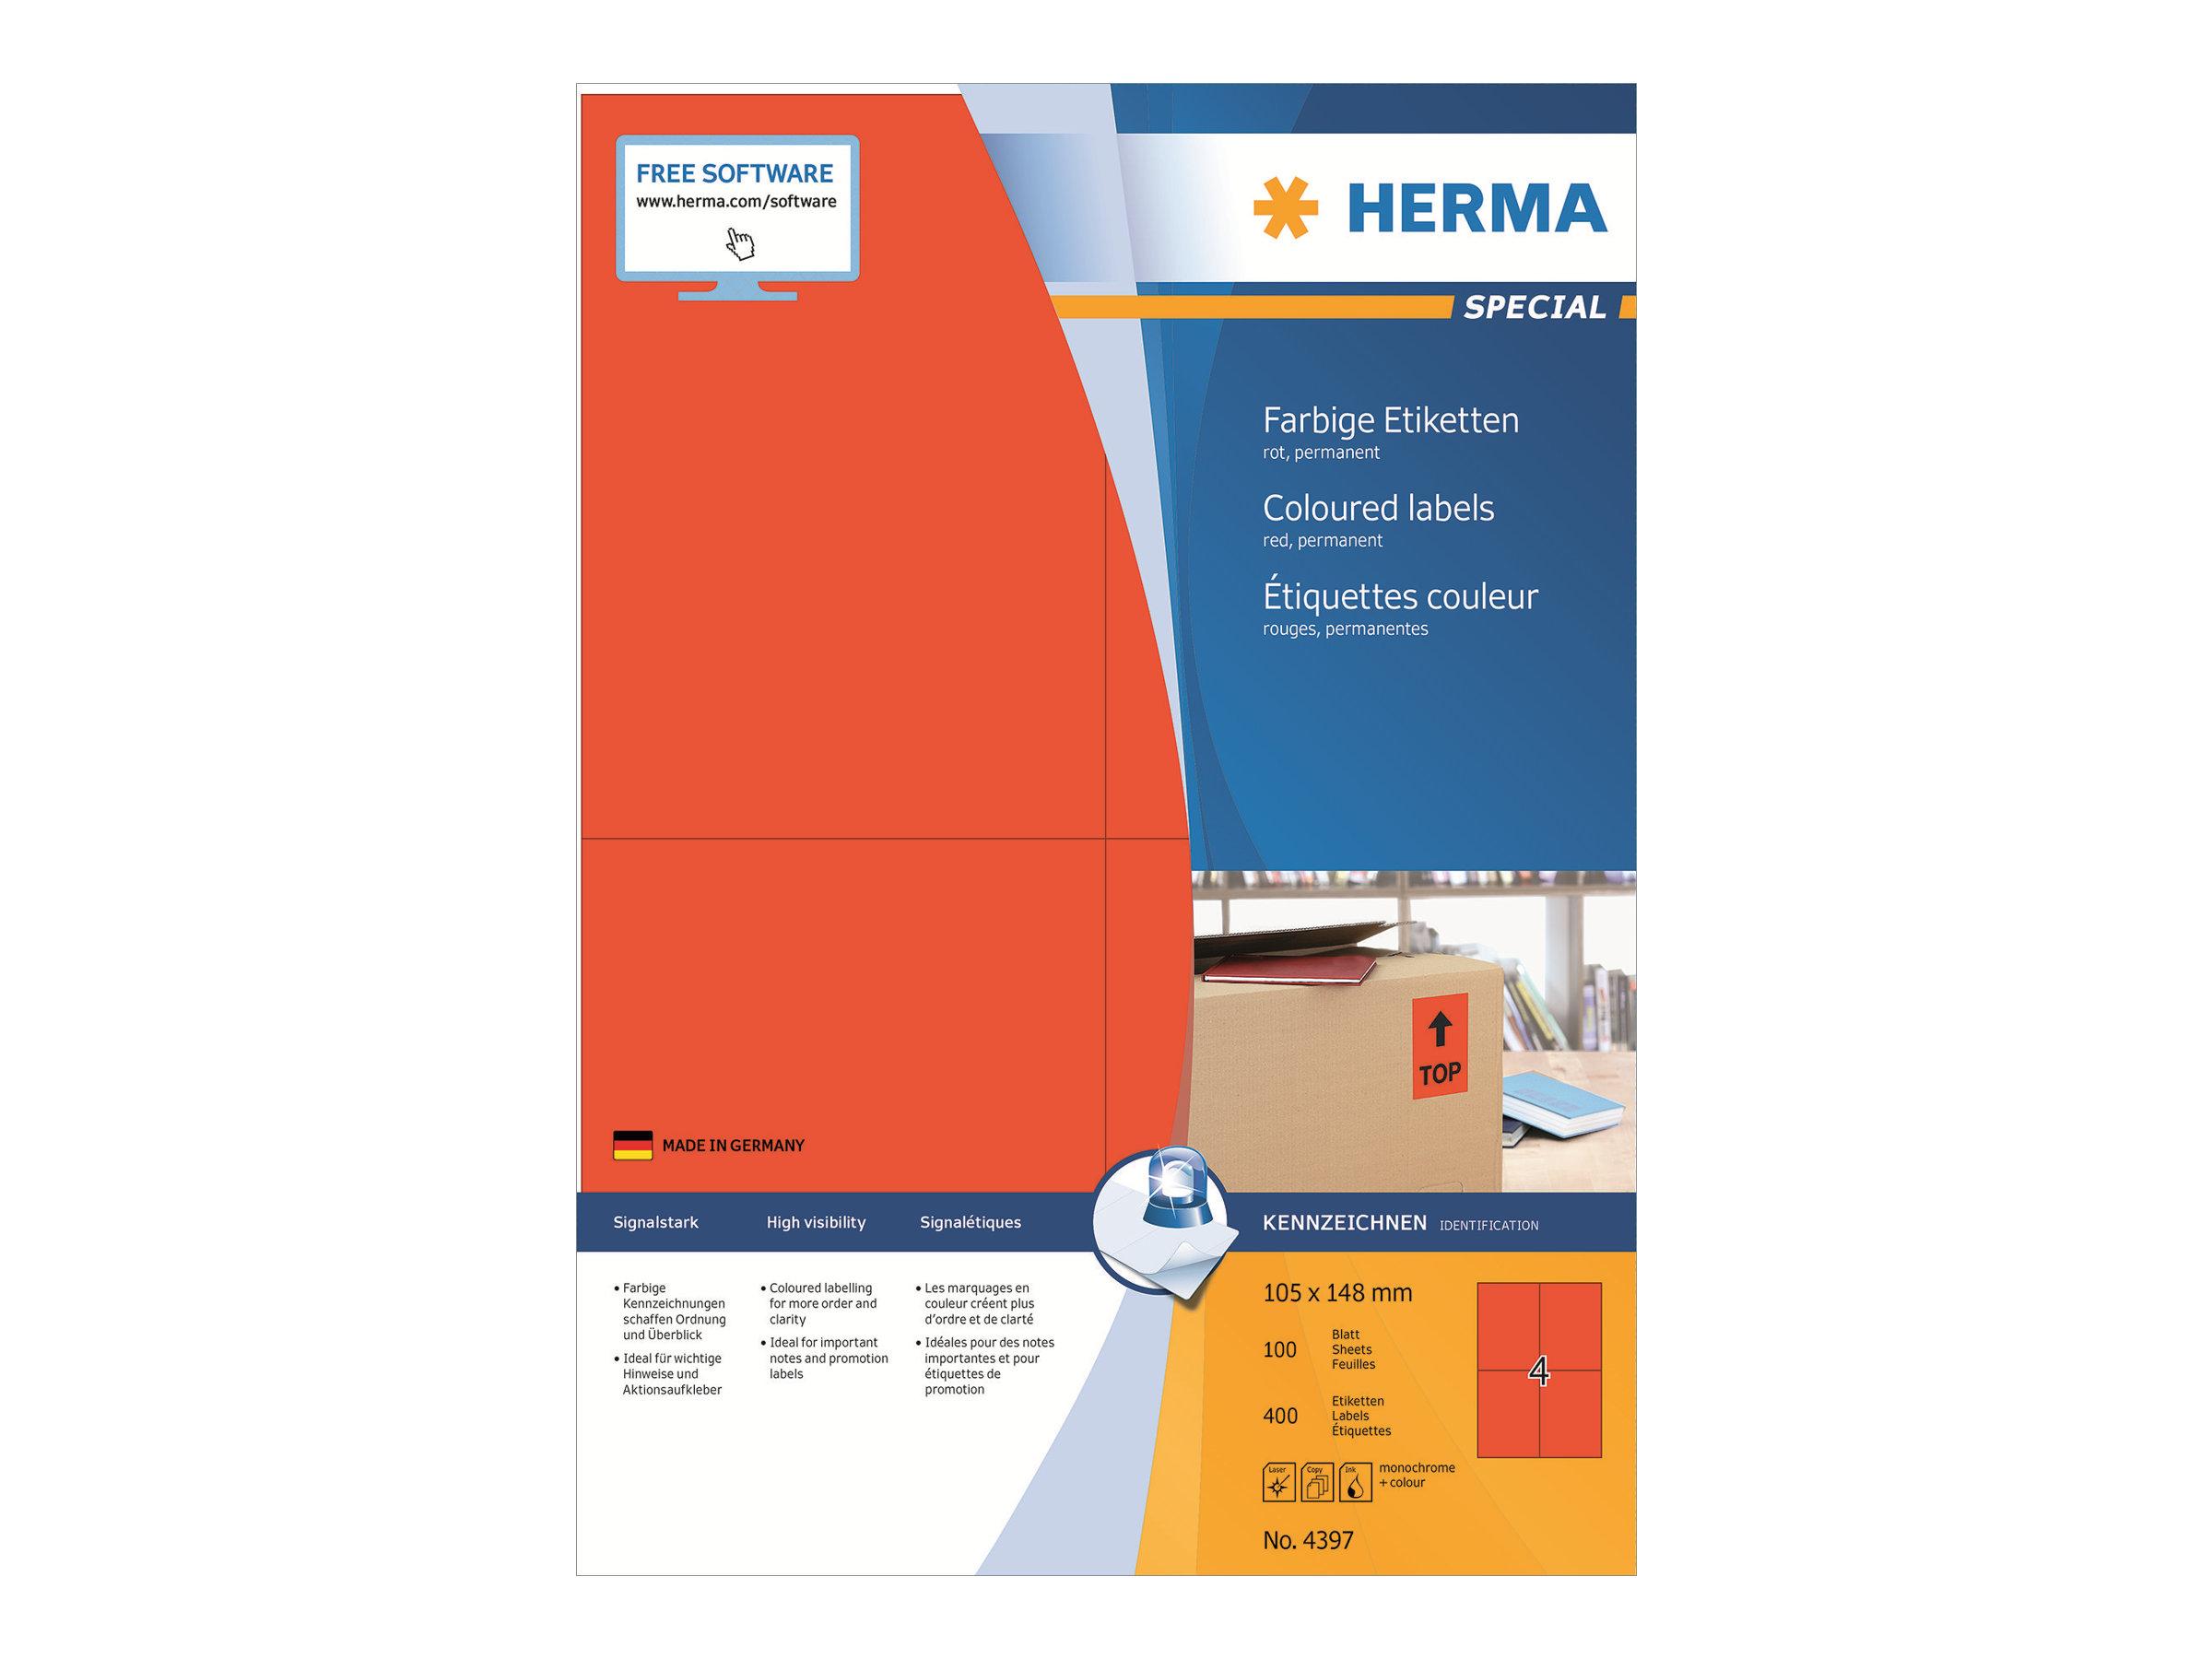 HERMA Special - Papier - matt - permanent selbstklebend - Rot - 192 x 61 mm 400 Etikett(en) (100 Bogen x 4)